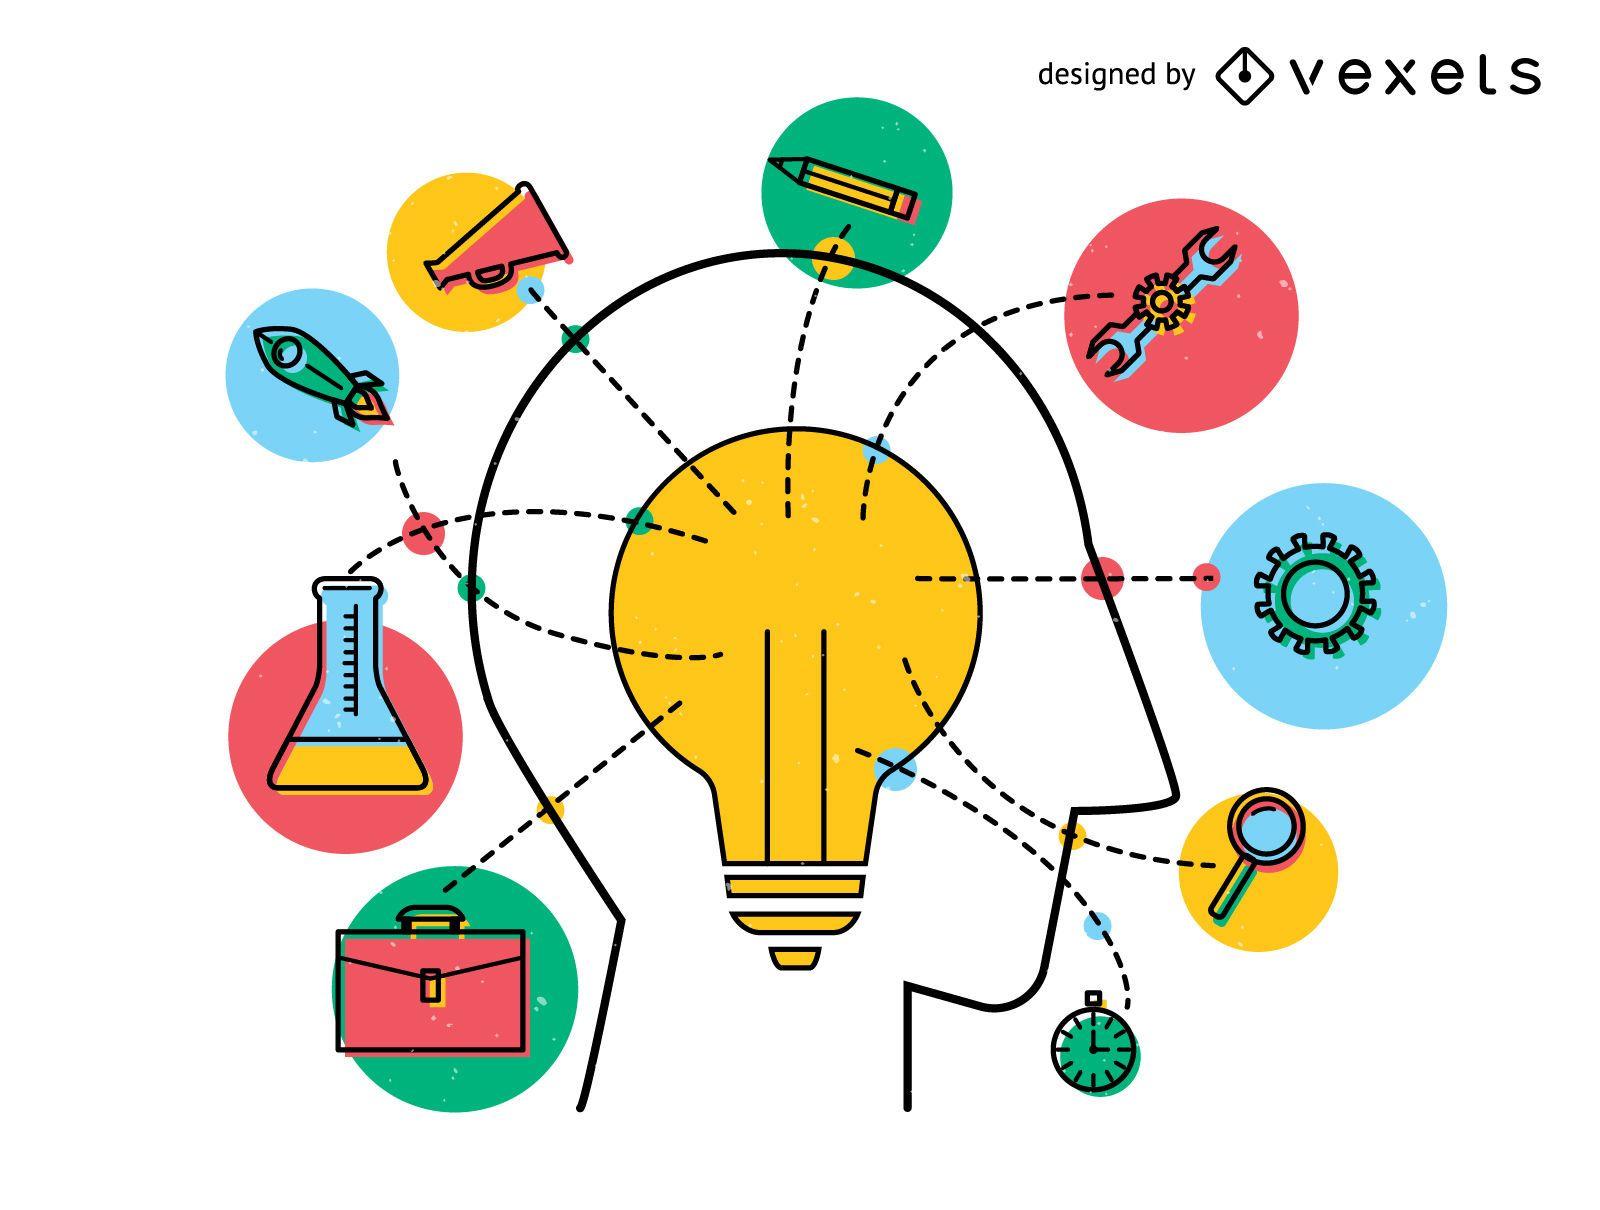 Innovation concept idea design